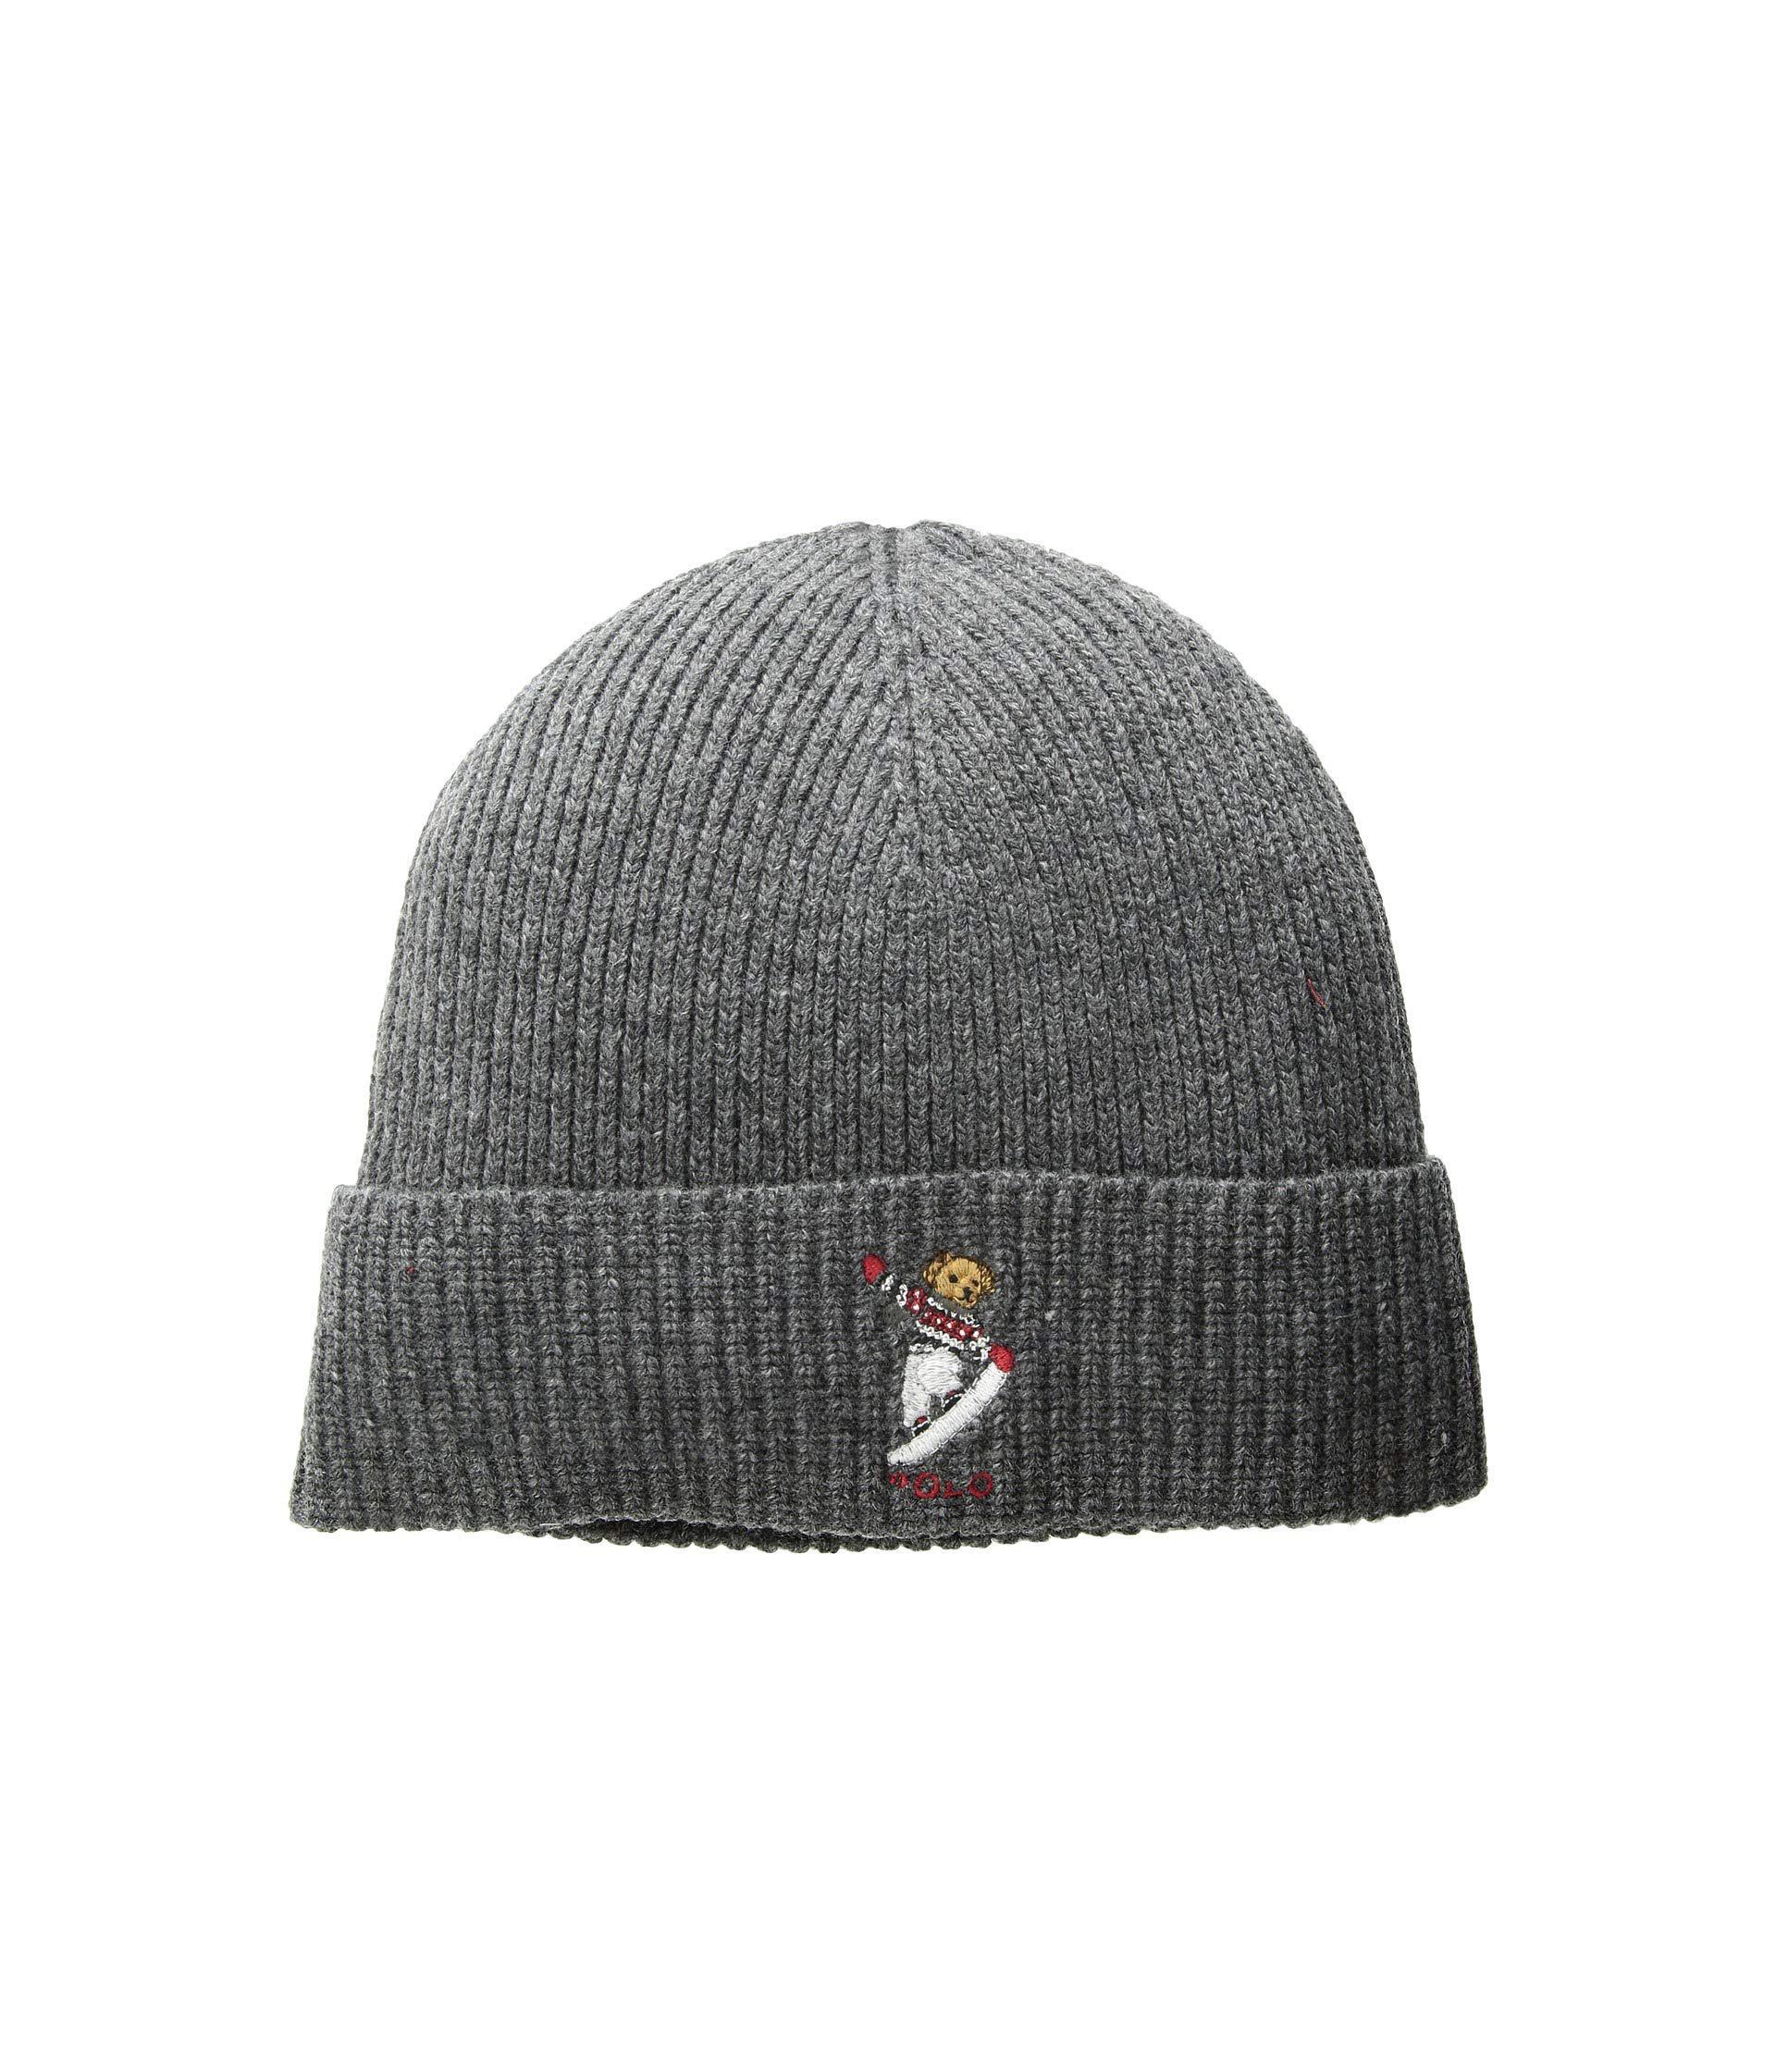 dba7c81c566 Lyst - Polo Ralph Lauren Skate Bear Hat (charcoal) Beanies in Gray ...